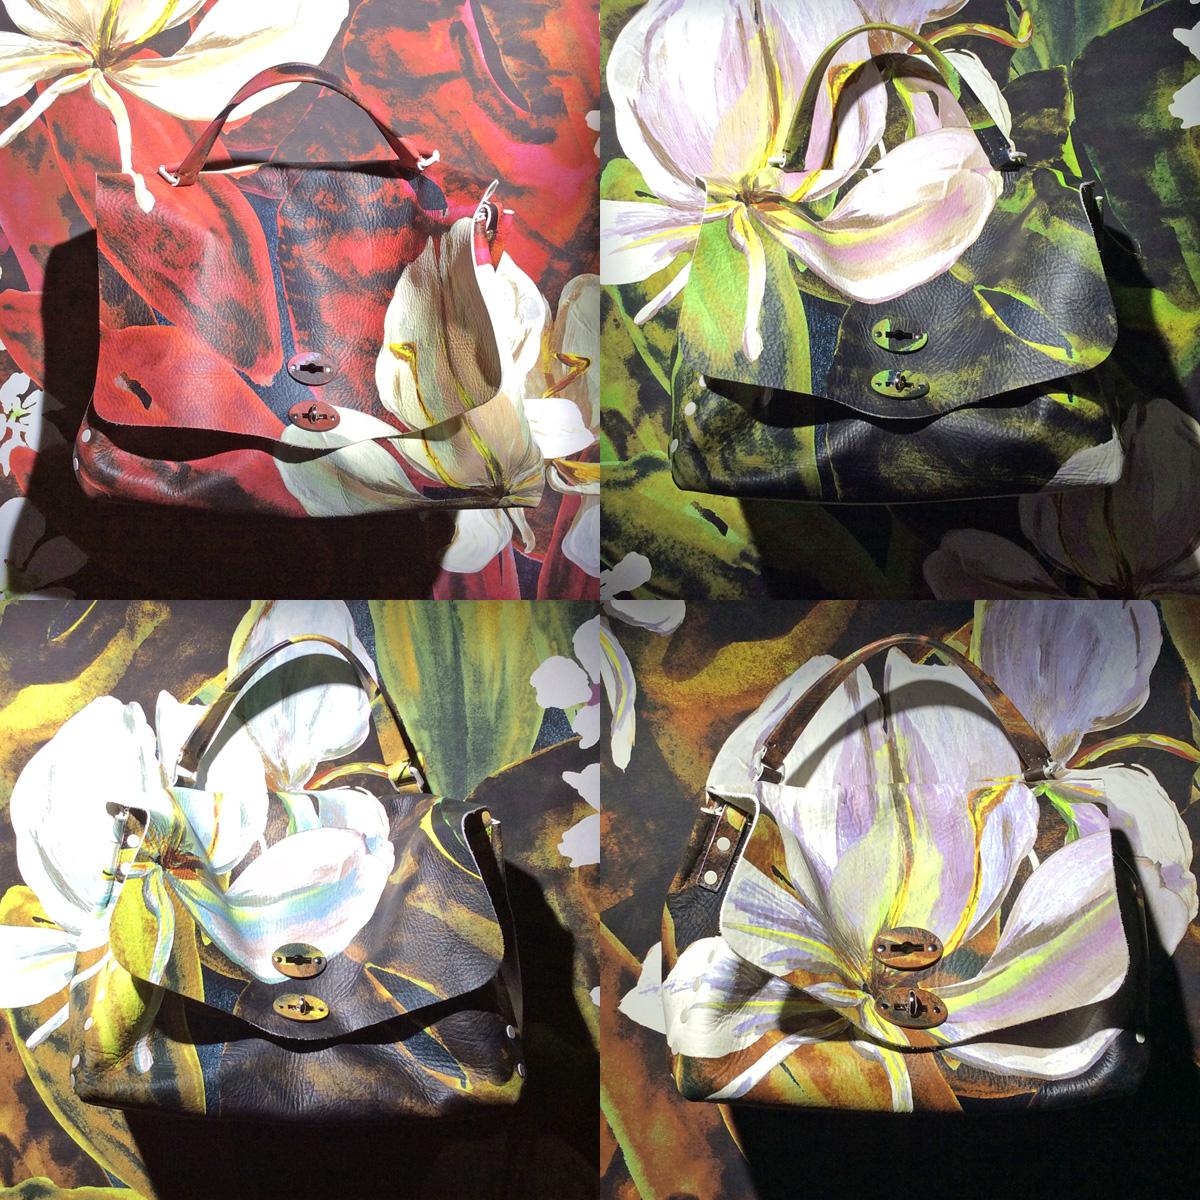 zanellato mariposa